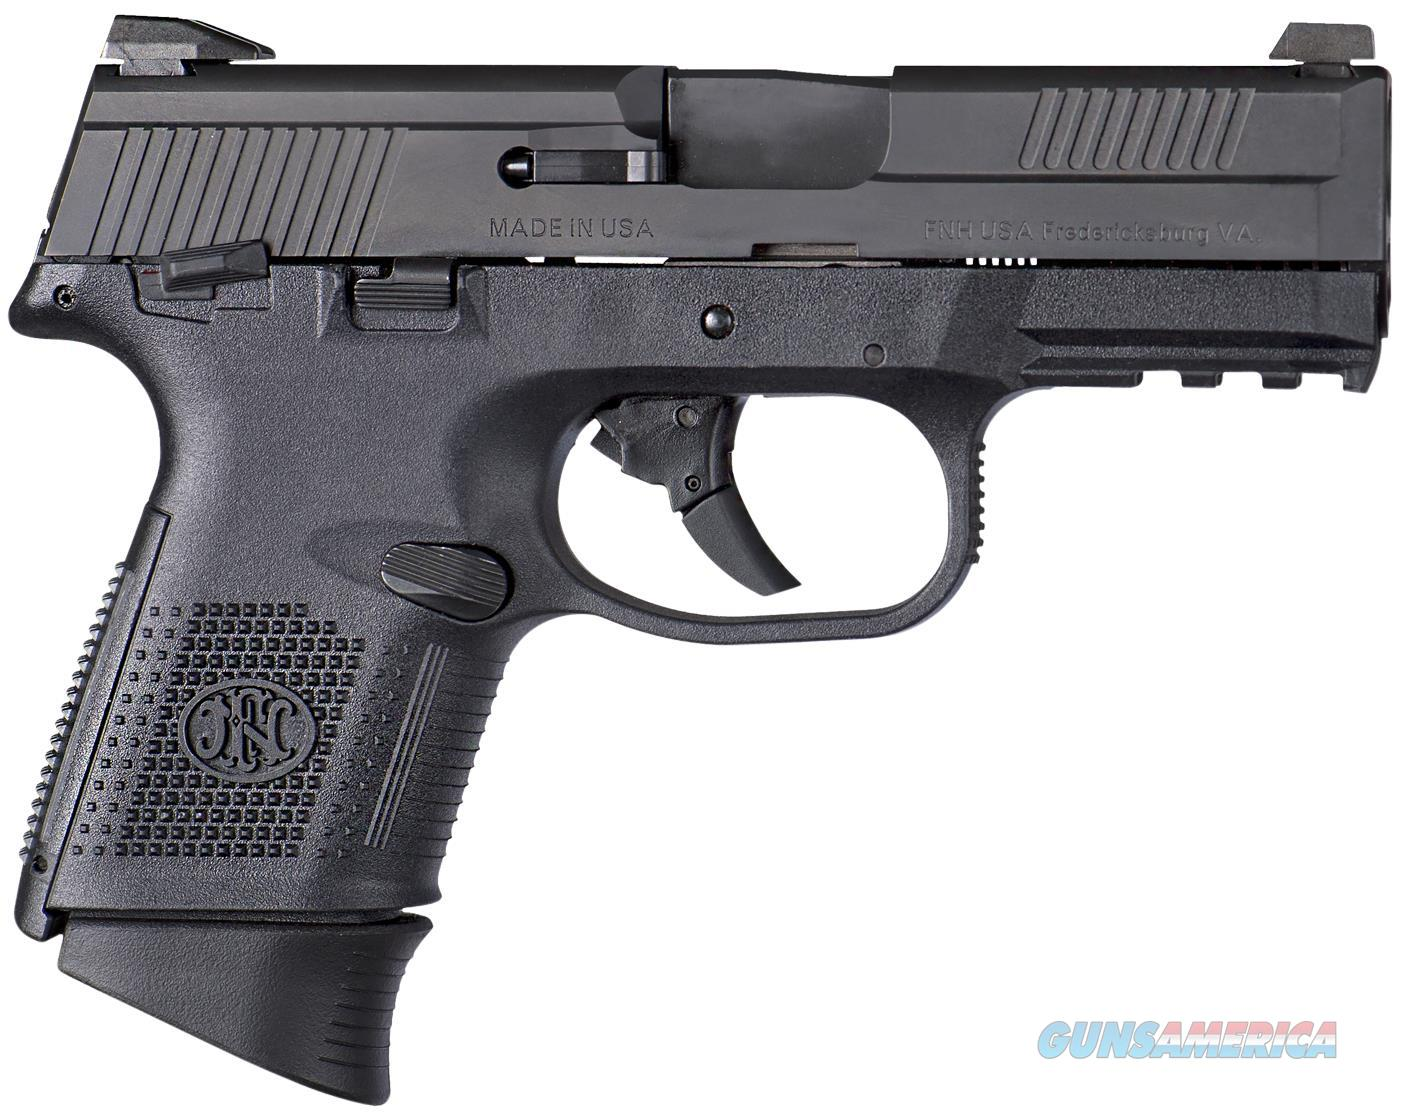 "Fn 66780 Fns 40 Compact Dbl 40 S&W 3.6"" 14+1 Polymer Grip Black 66780  Guns > Pistols > F Misc Pistols"